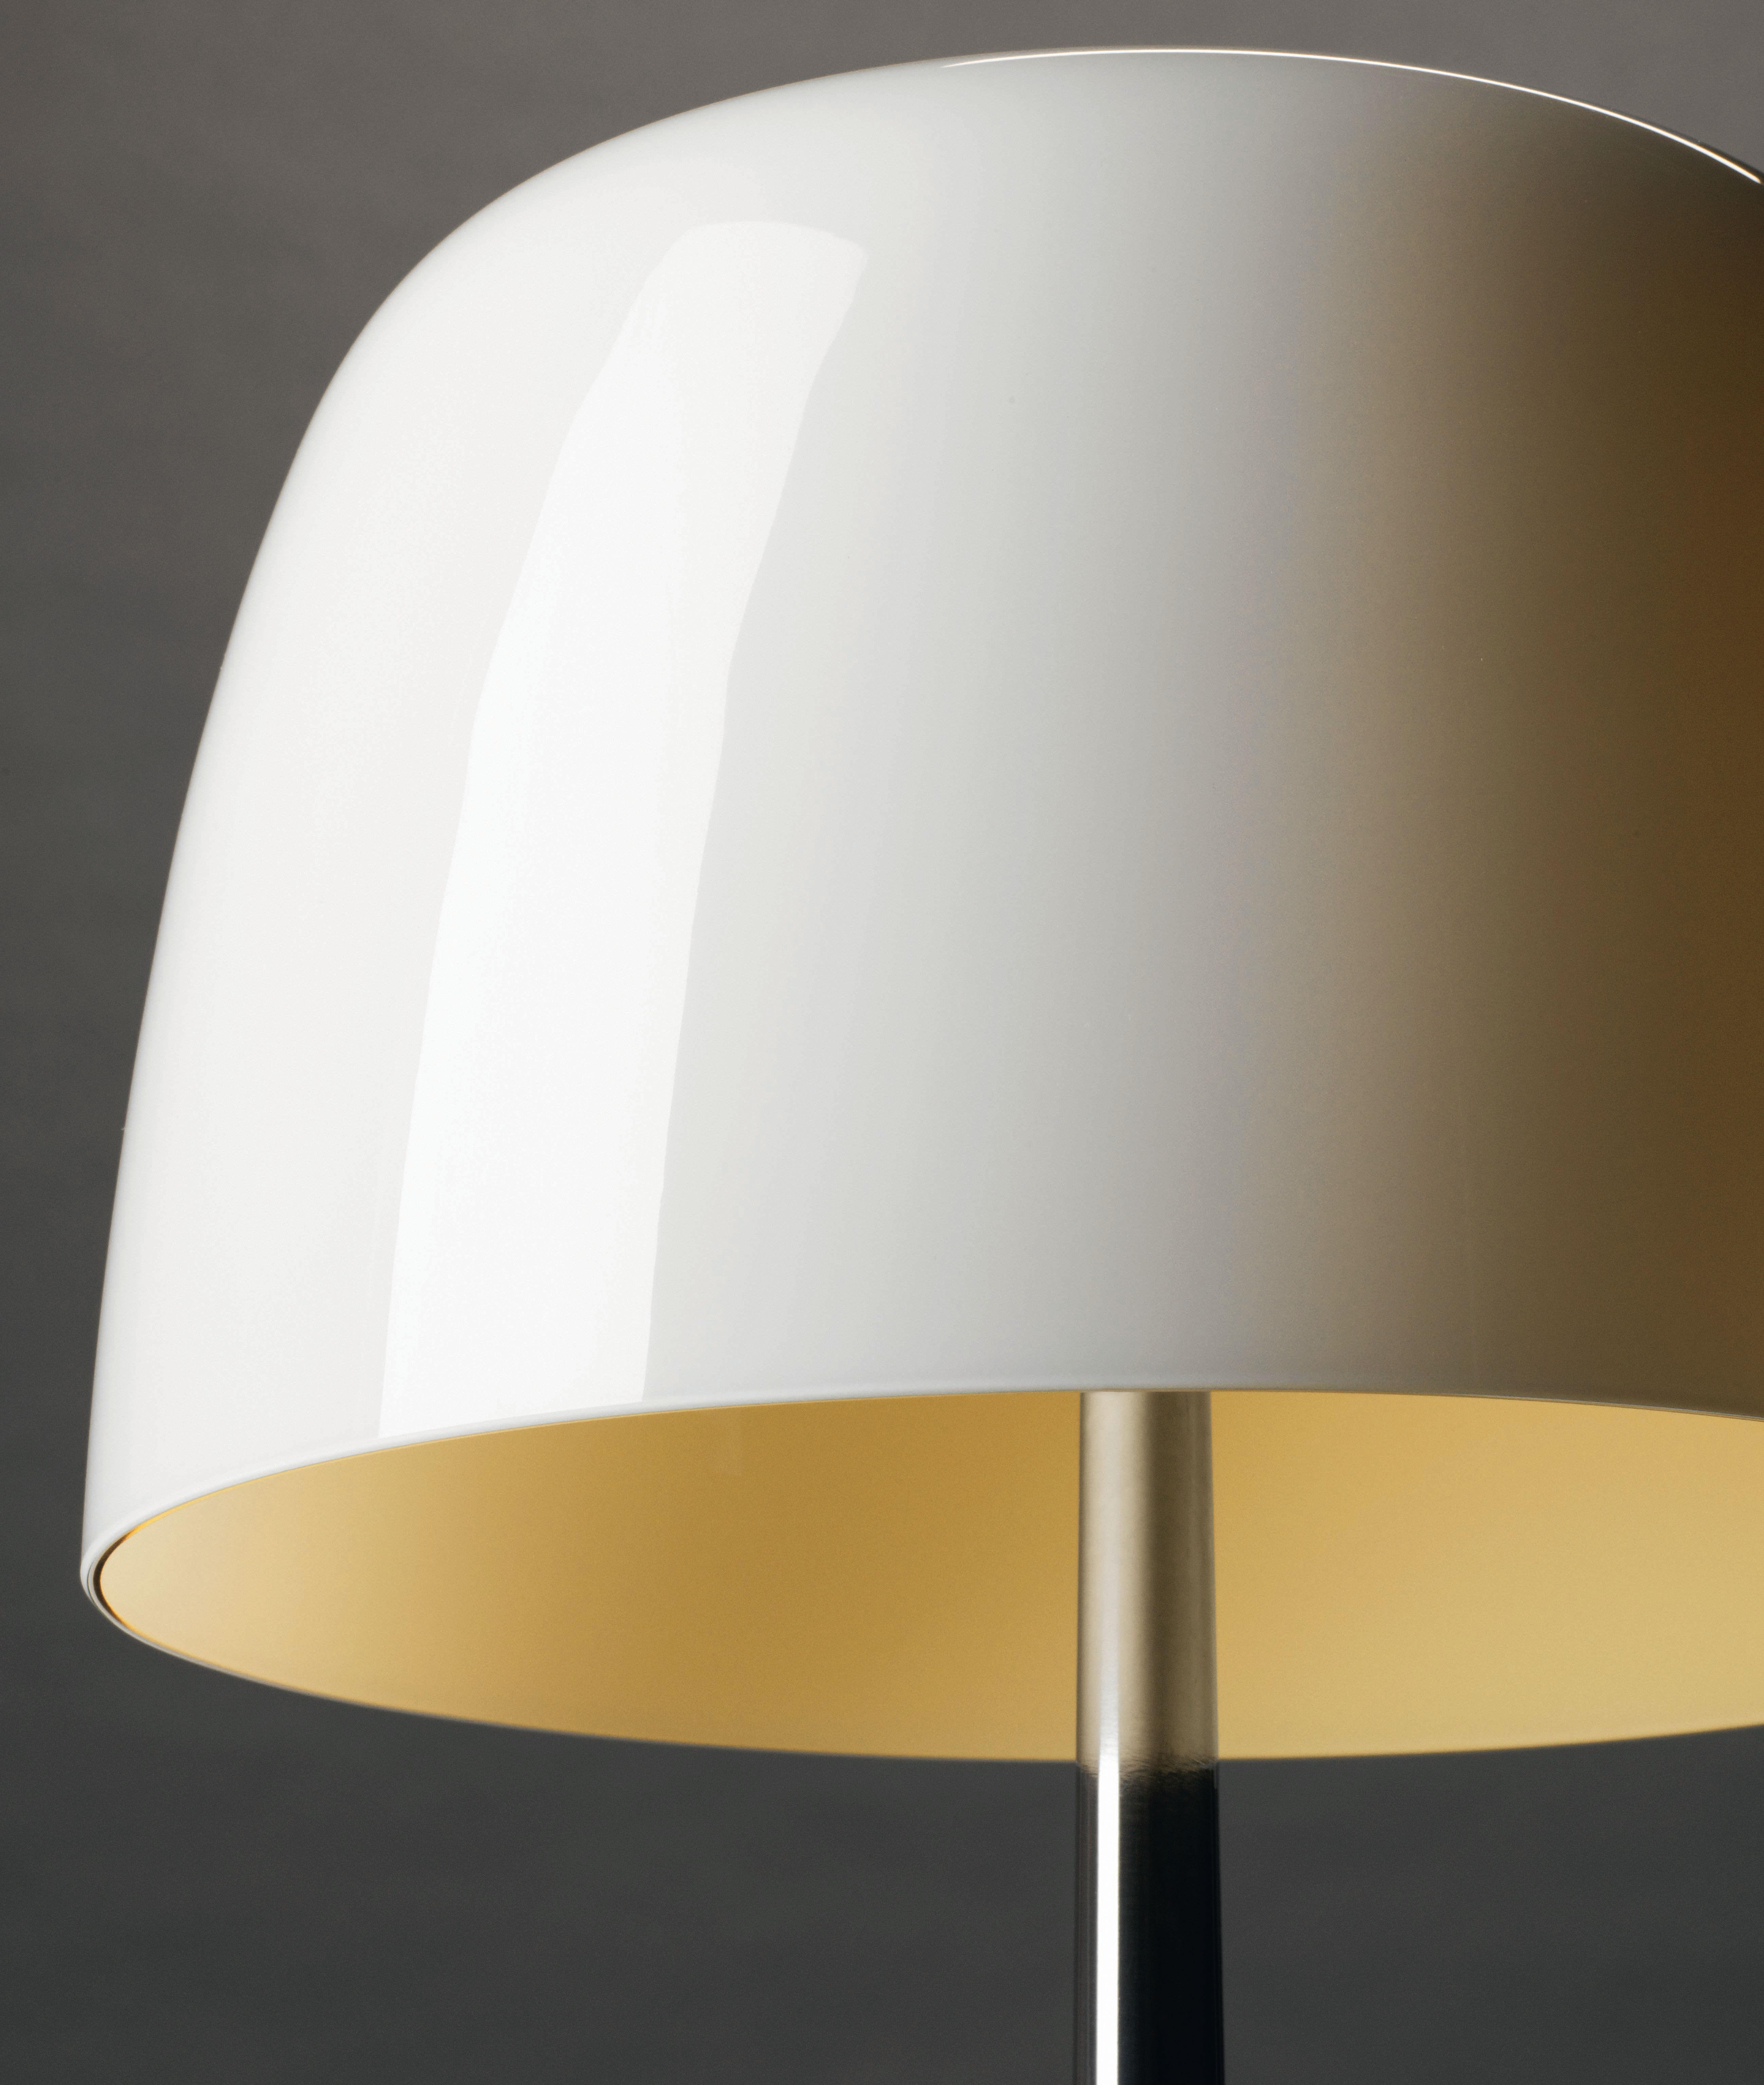 lampe de table lumi re piccola variateur h 35 cm blanc chaud pied alu poli foscarini. Black Bedroom Furniture Sets. Home Design Ideas